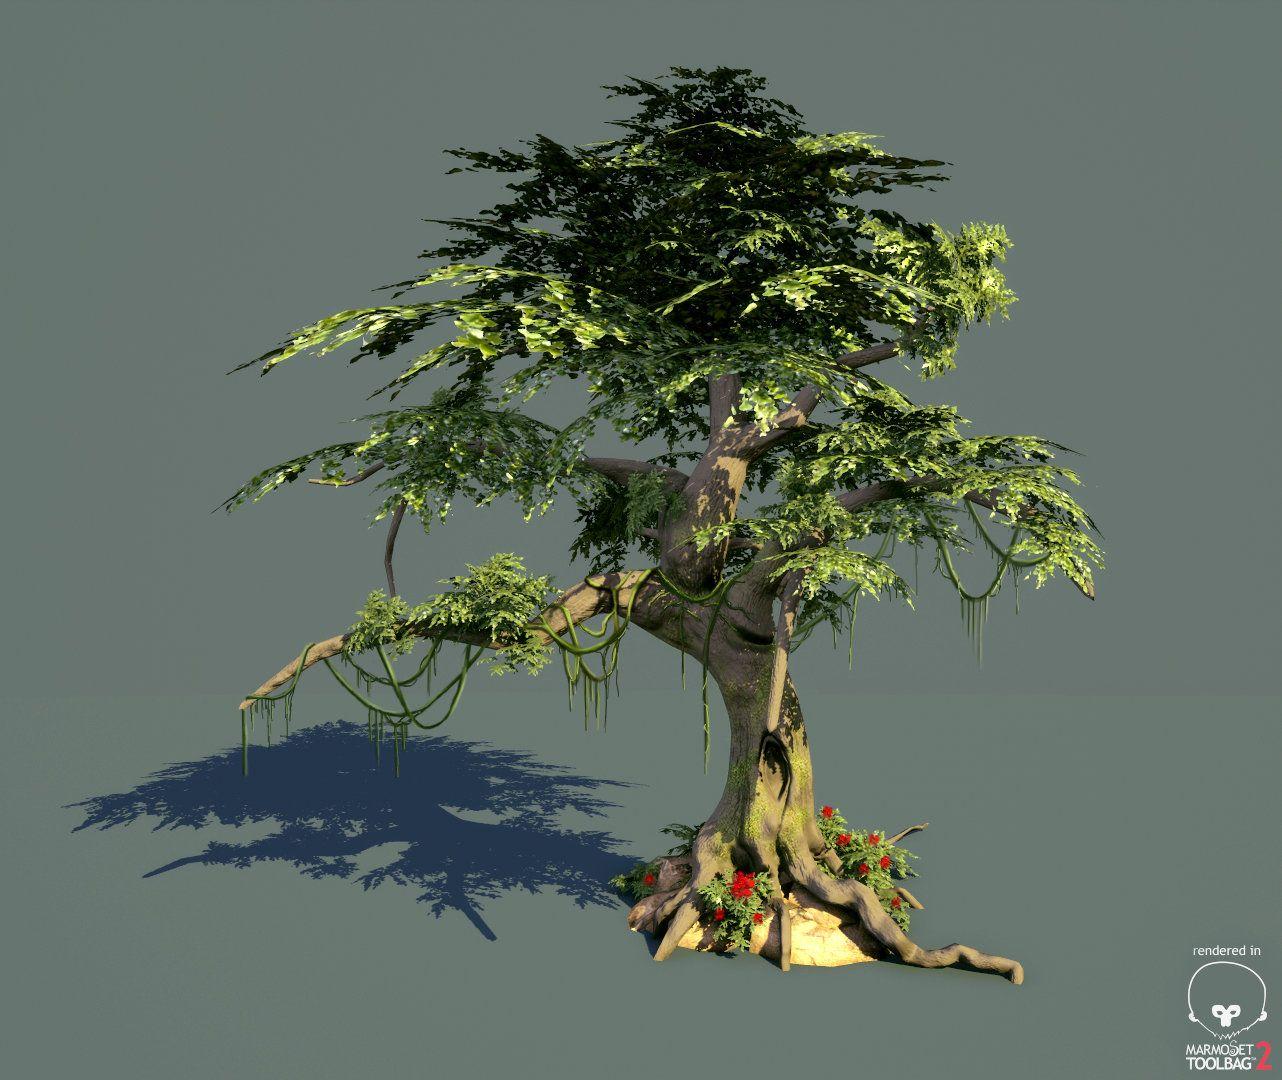 LowPoly Tree, Mehran Bagheri (Suni) on ArtStation at https://www.artstation.com/artwork/bg3vd